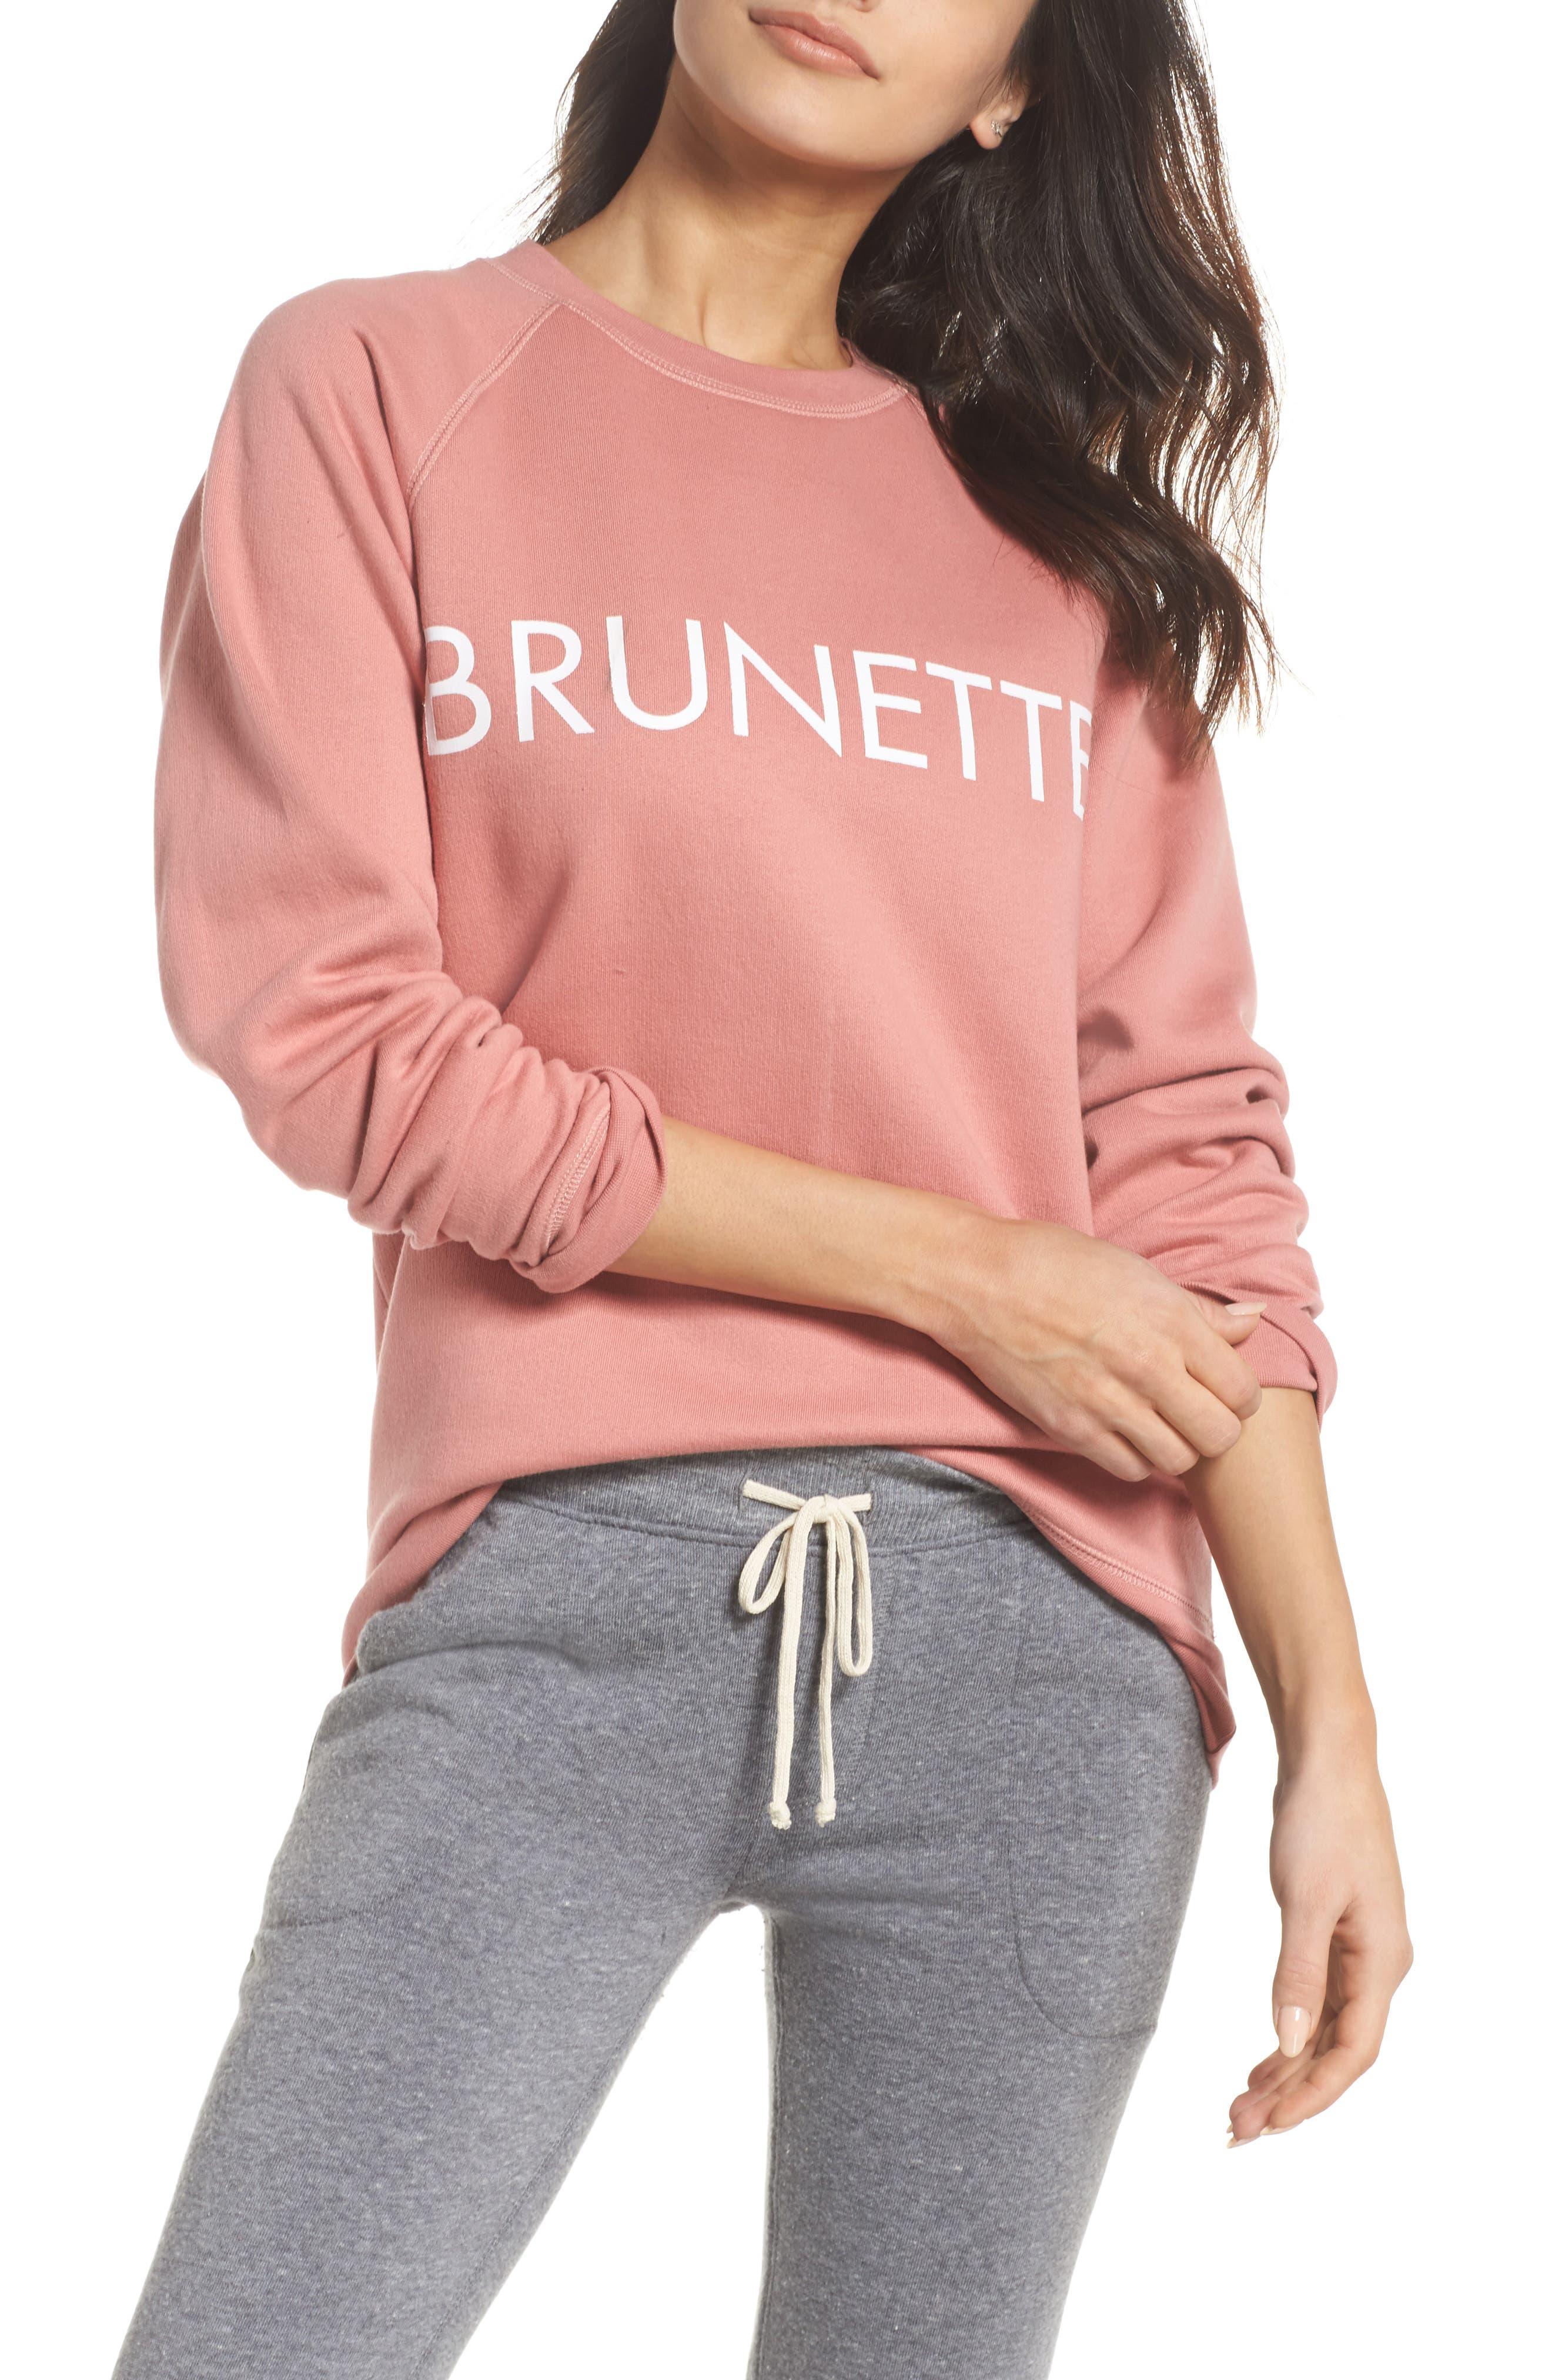 Brunette Crewneck Sweatshirt,                         Main,                         color, Dusty Rose